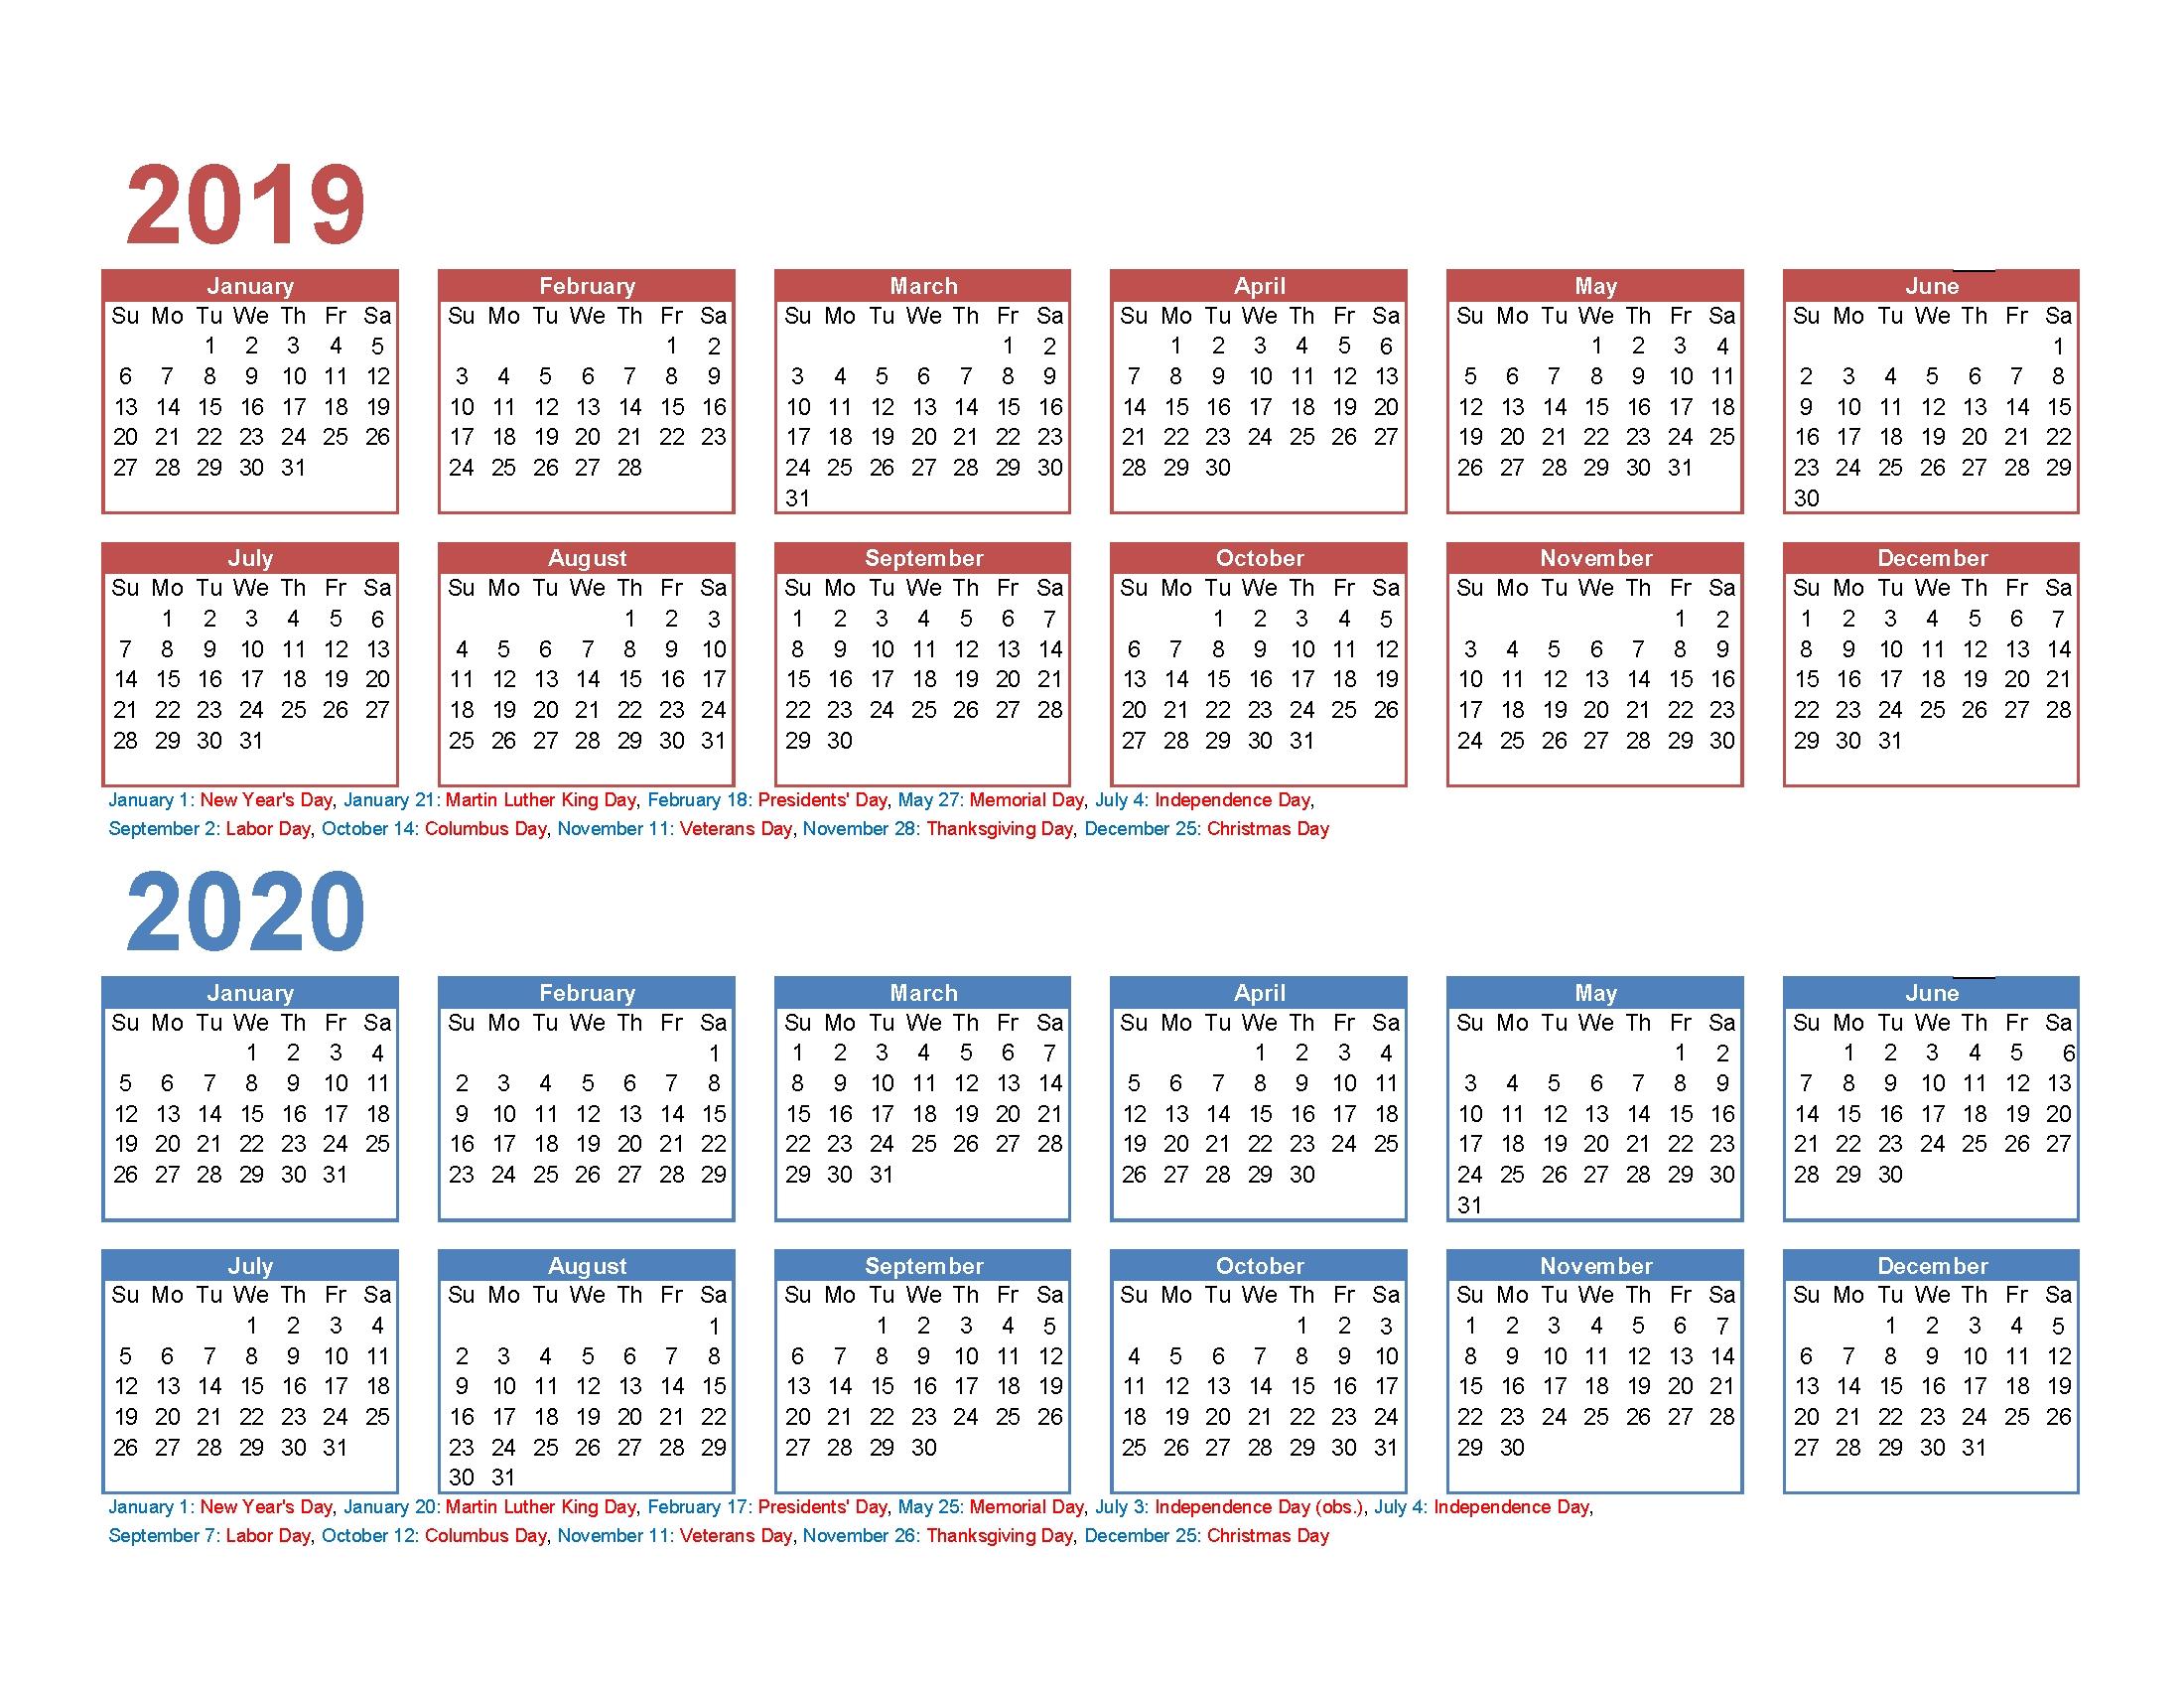 Print 2 Year Calendar   Ten Free Printable Calendar 2020-2021